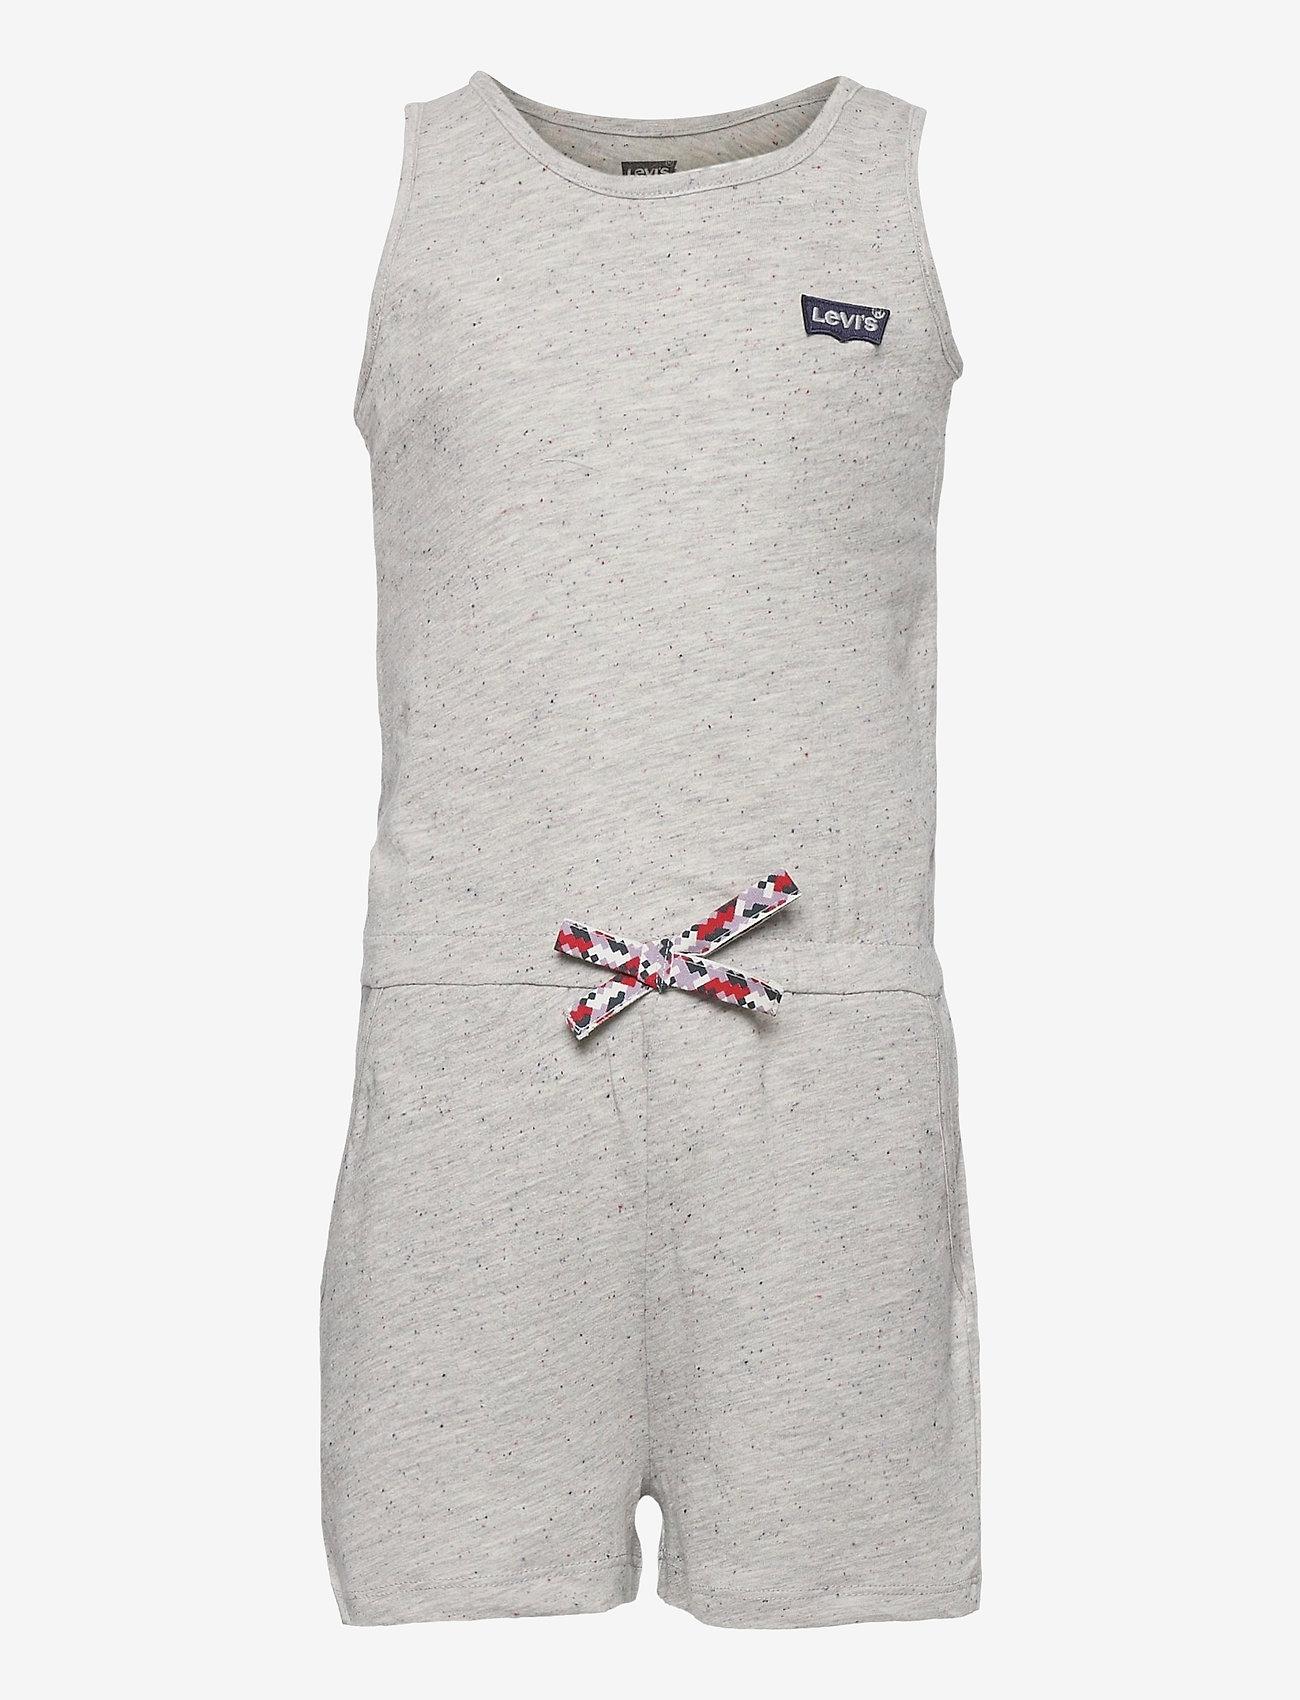 Levi's - LVG KNIT ROMPER - jumpsuits - grey heather - 0